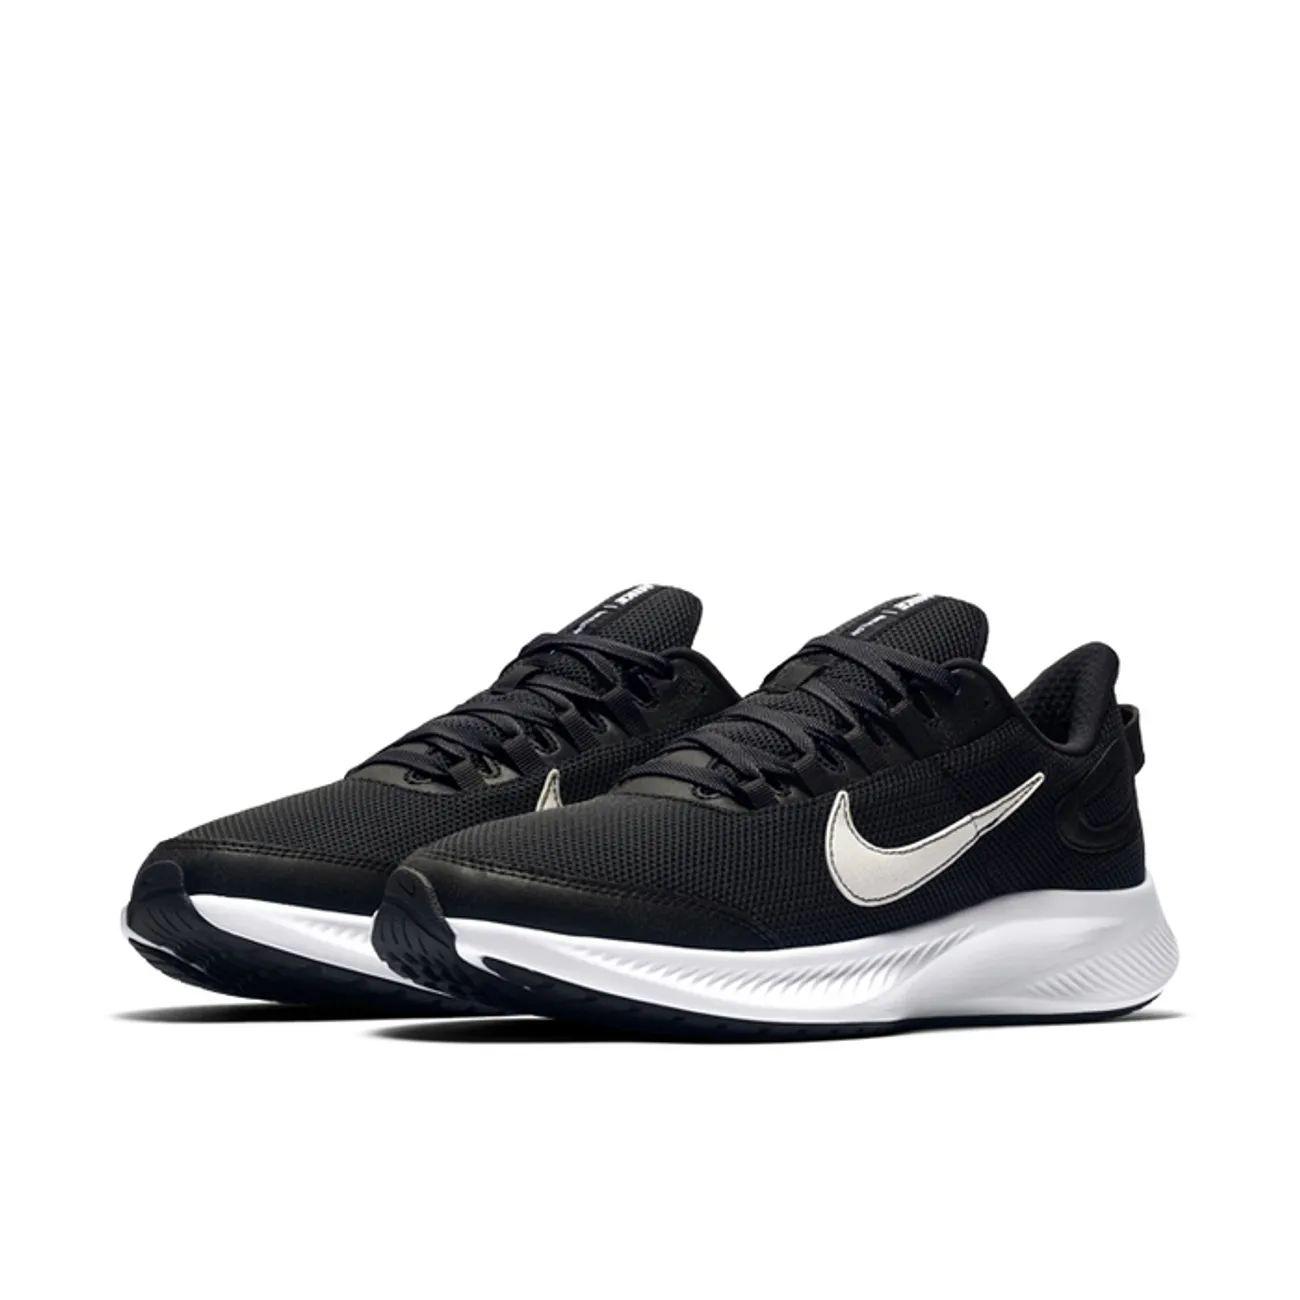 Baskets Nike Run All Day 2 - Tailles au choix